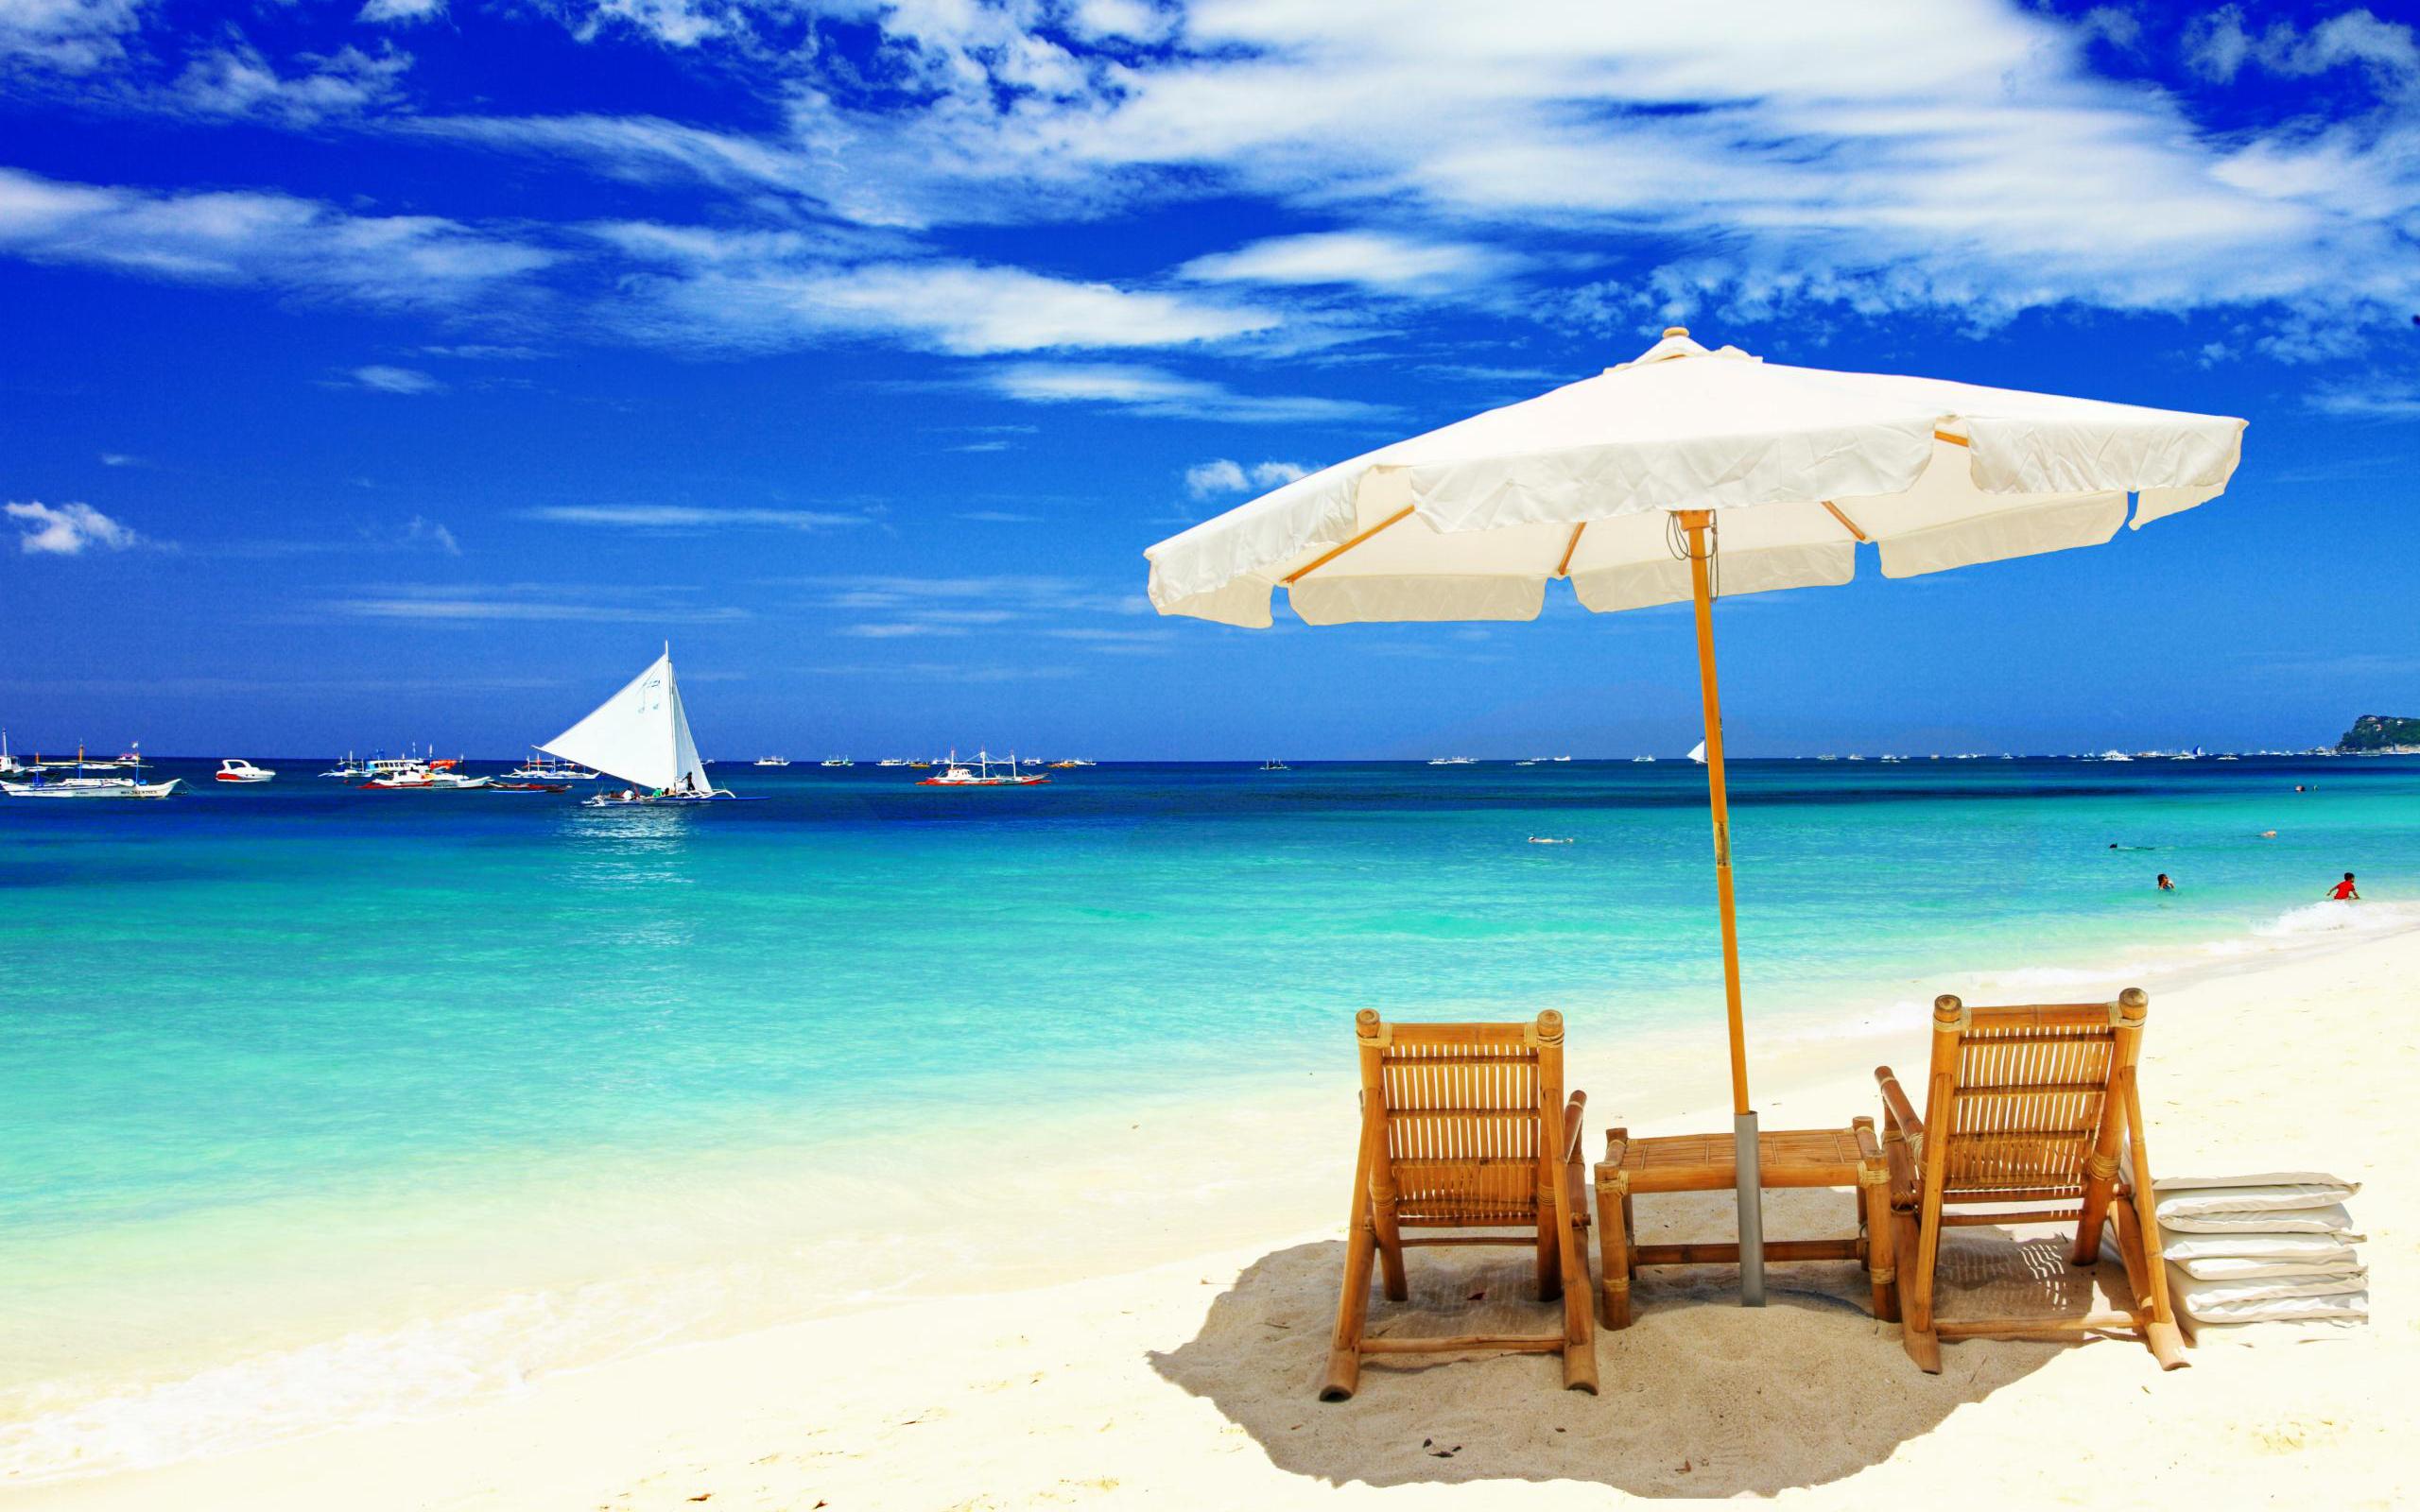 Beach Fun With Shade From The Sun